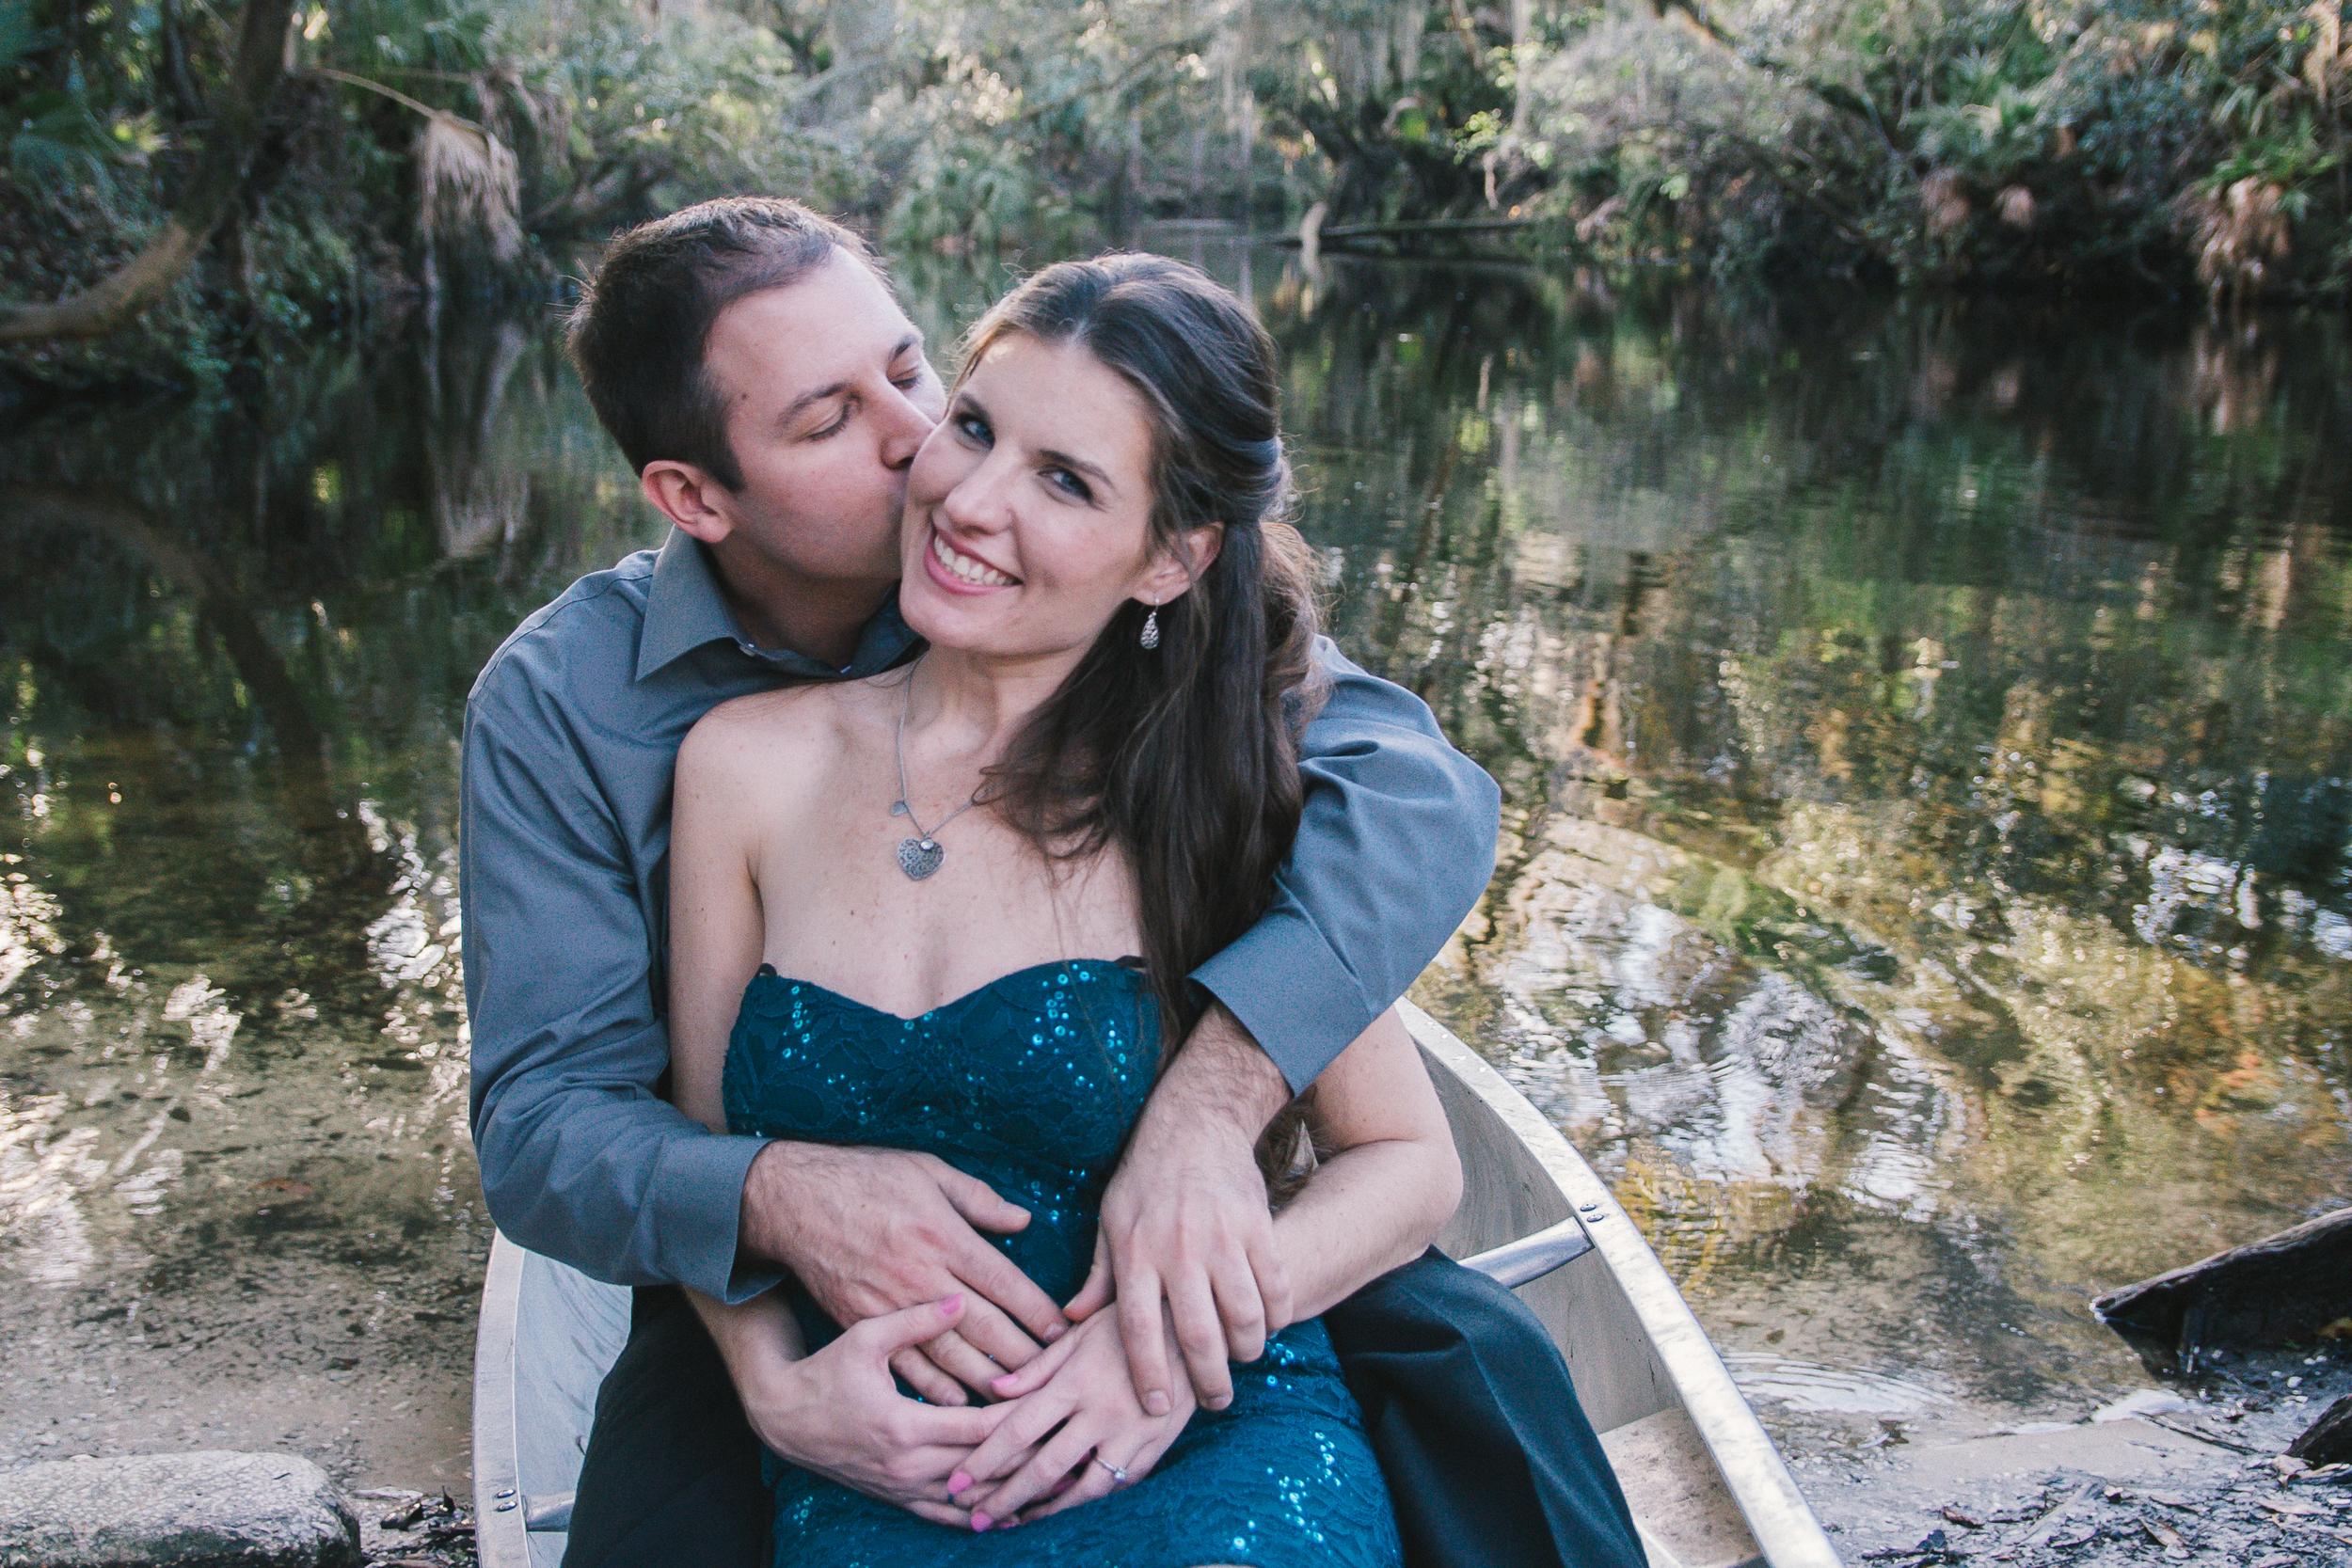 Tampa romantic canoe engagement session